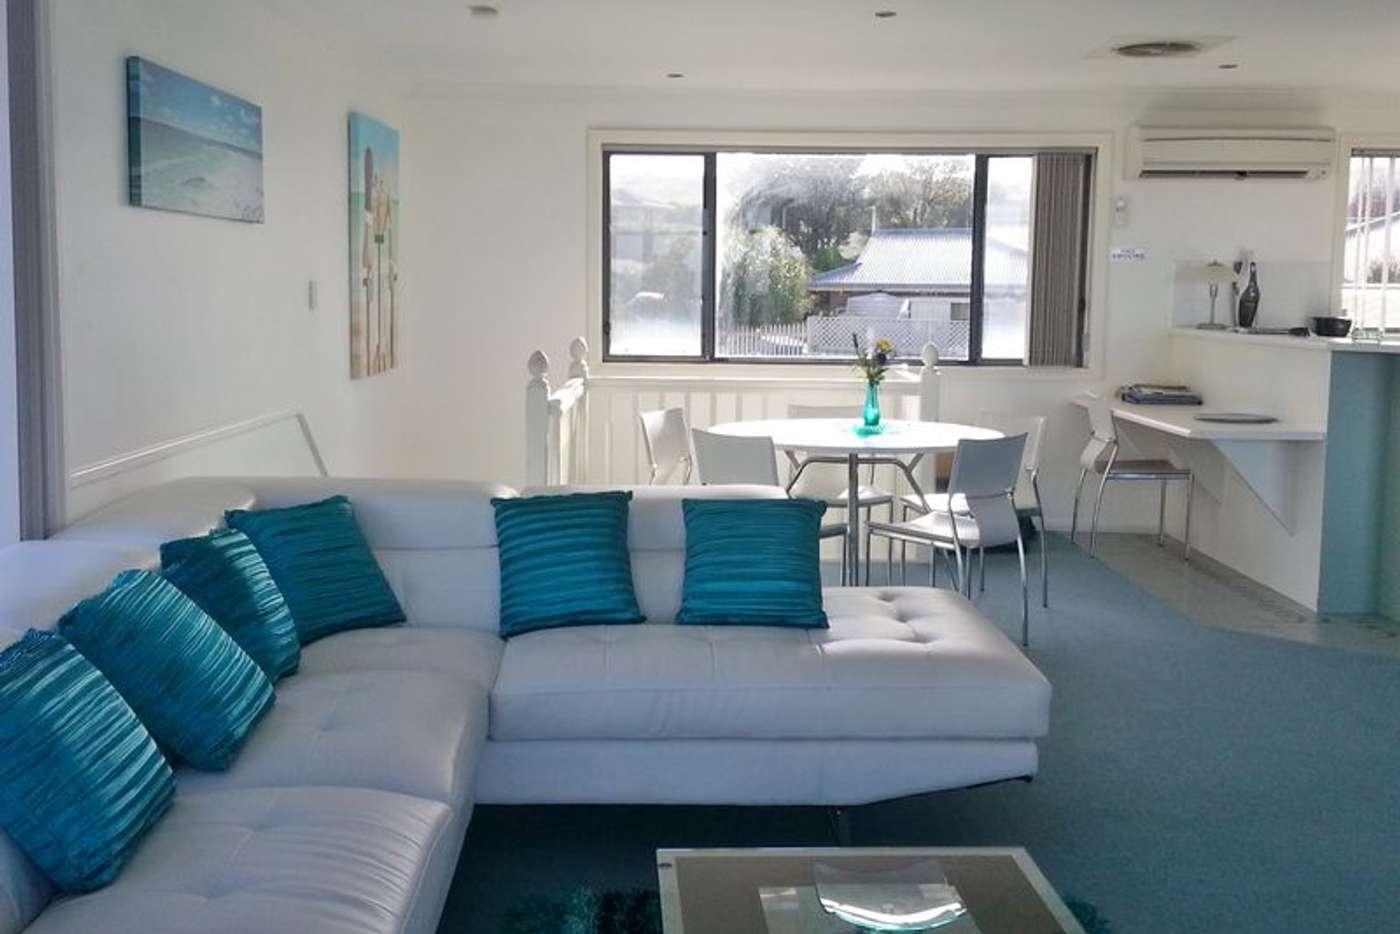 Sixth view of Homely house listing, 7A Millard Crt, Encounter Bay SA 5211